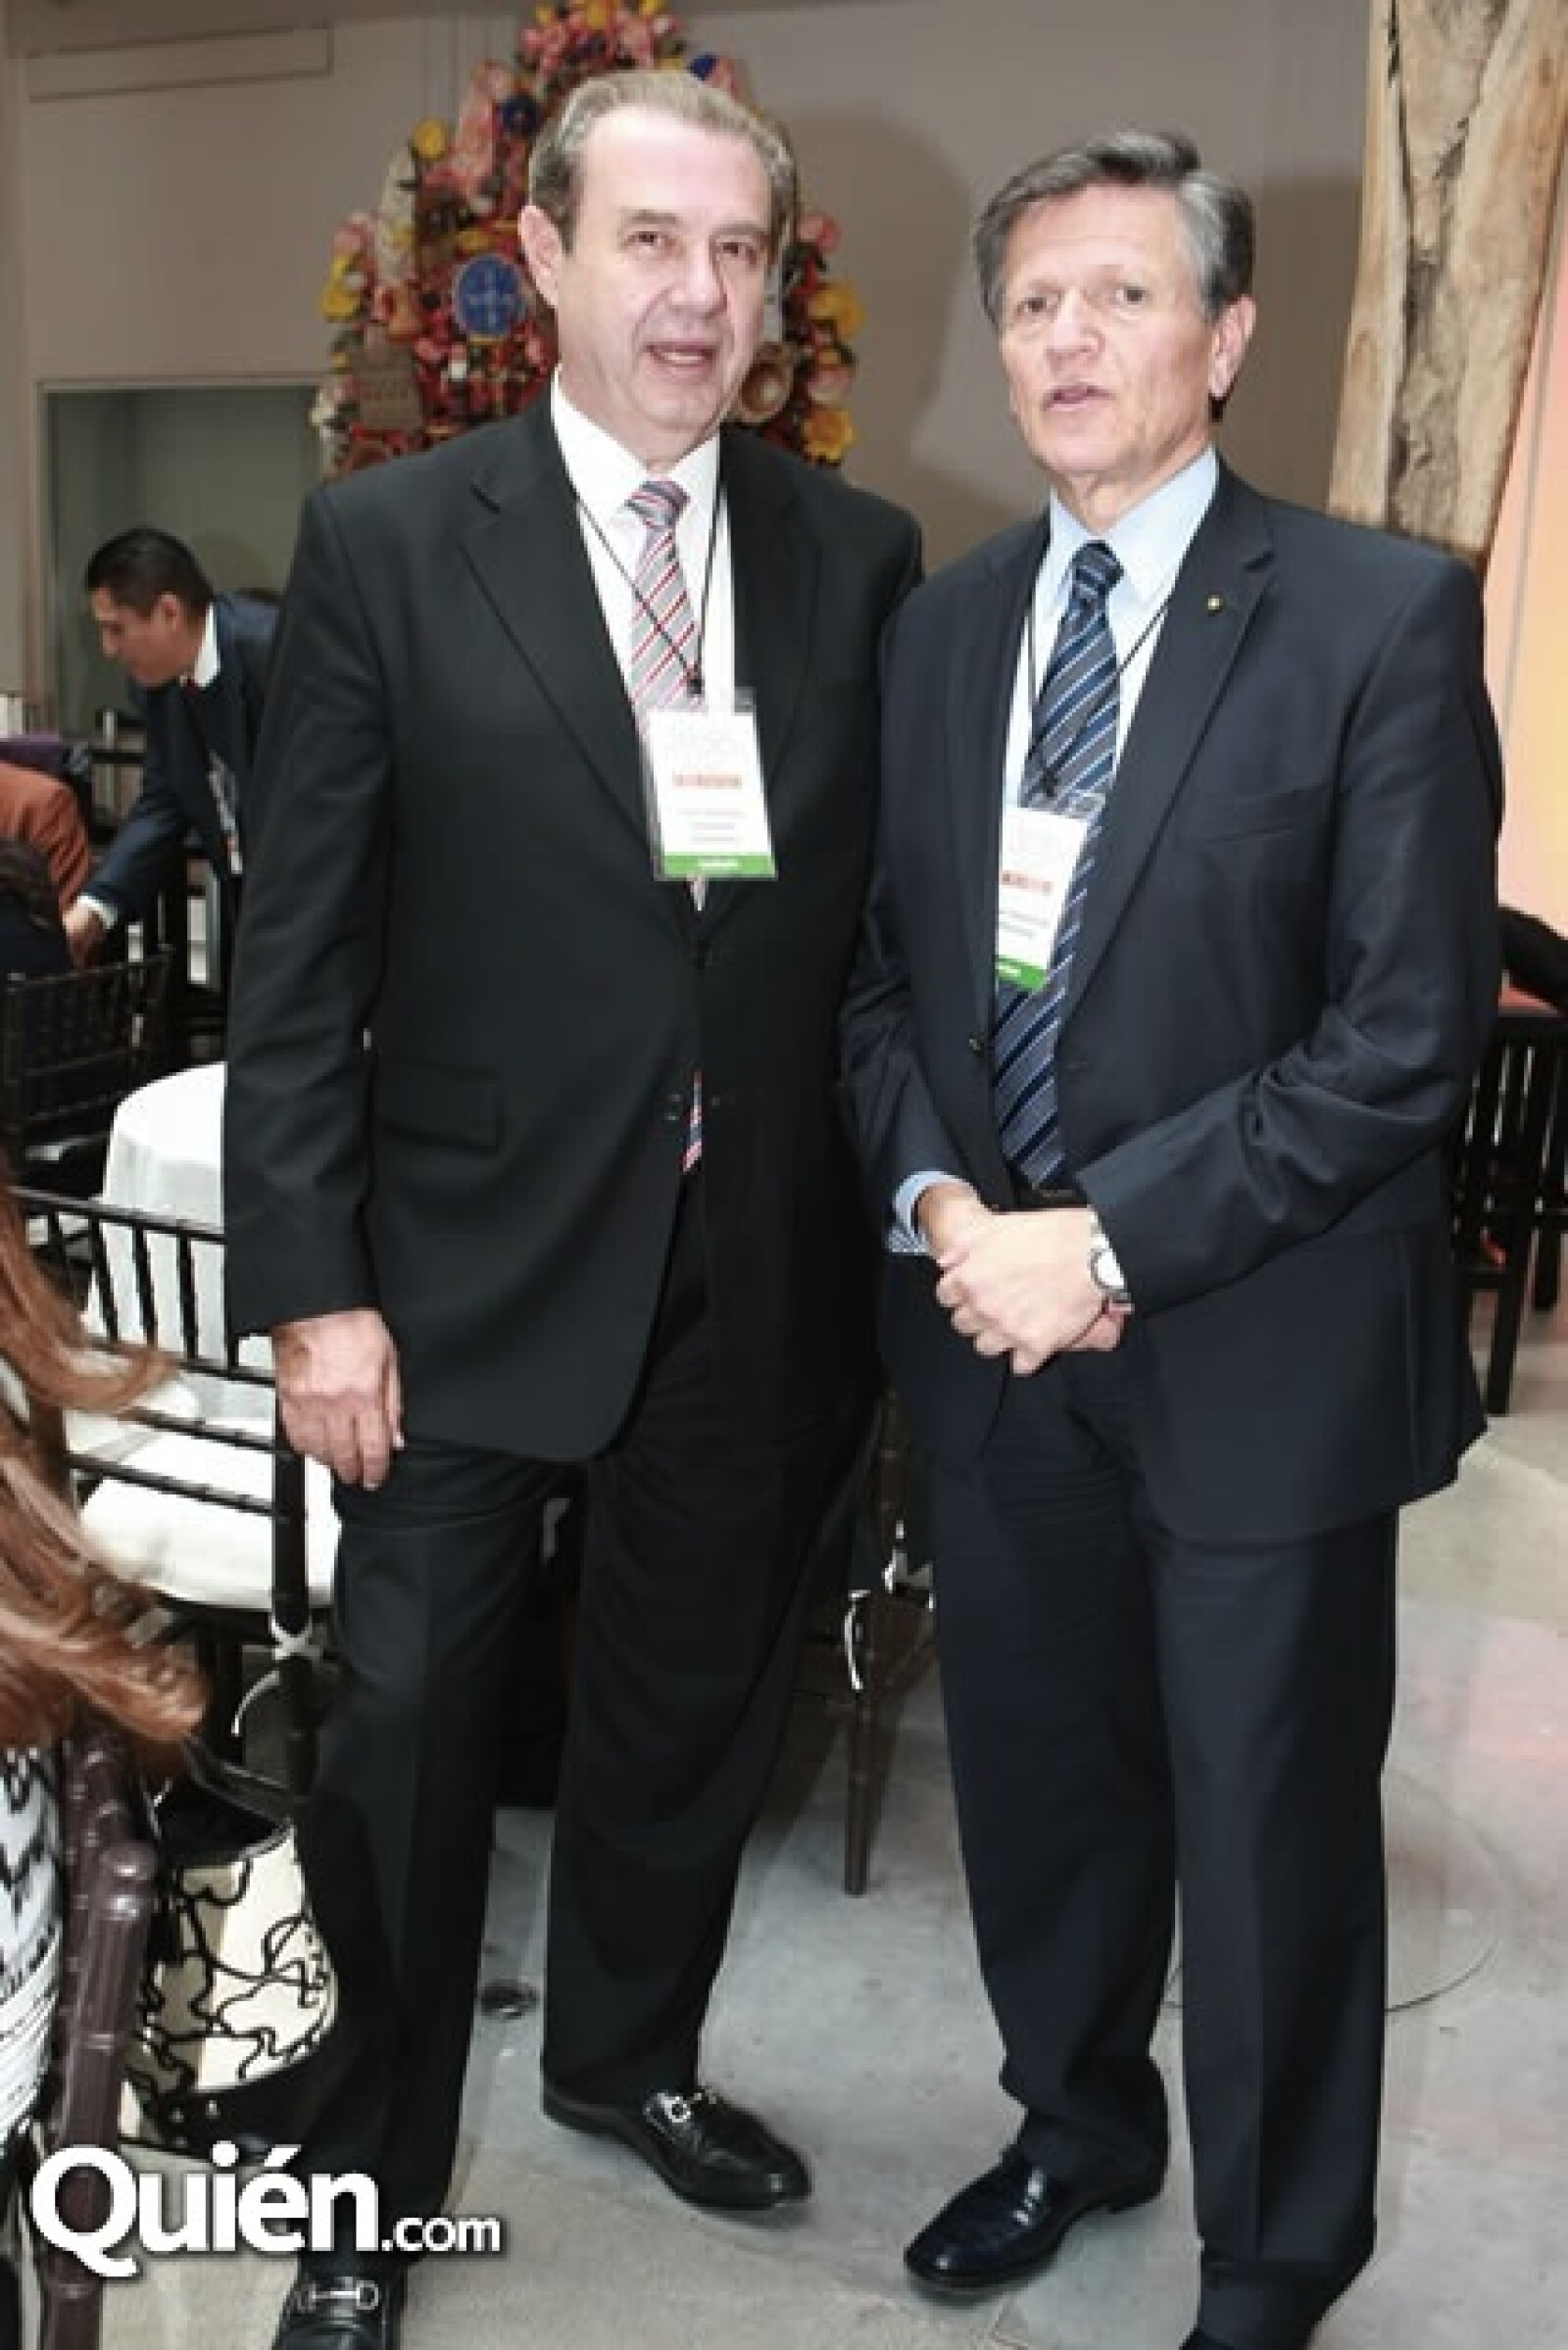 José Antonio Fernández e Isaac Chertorivski